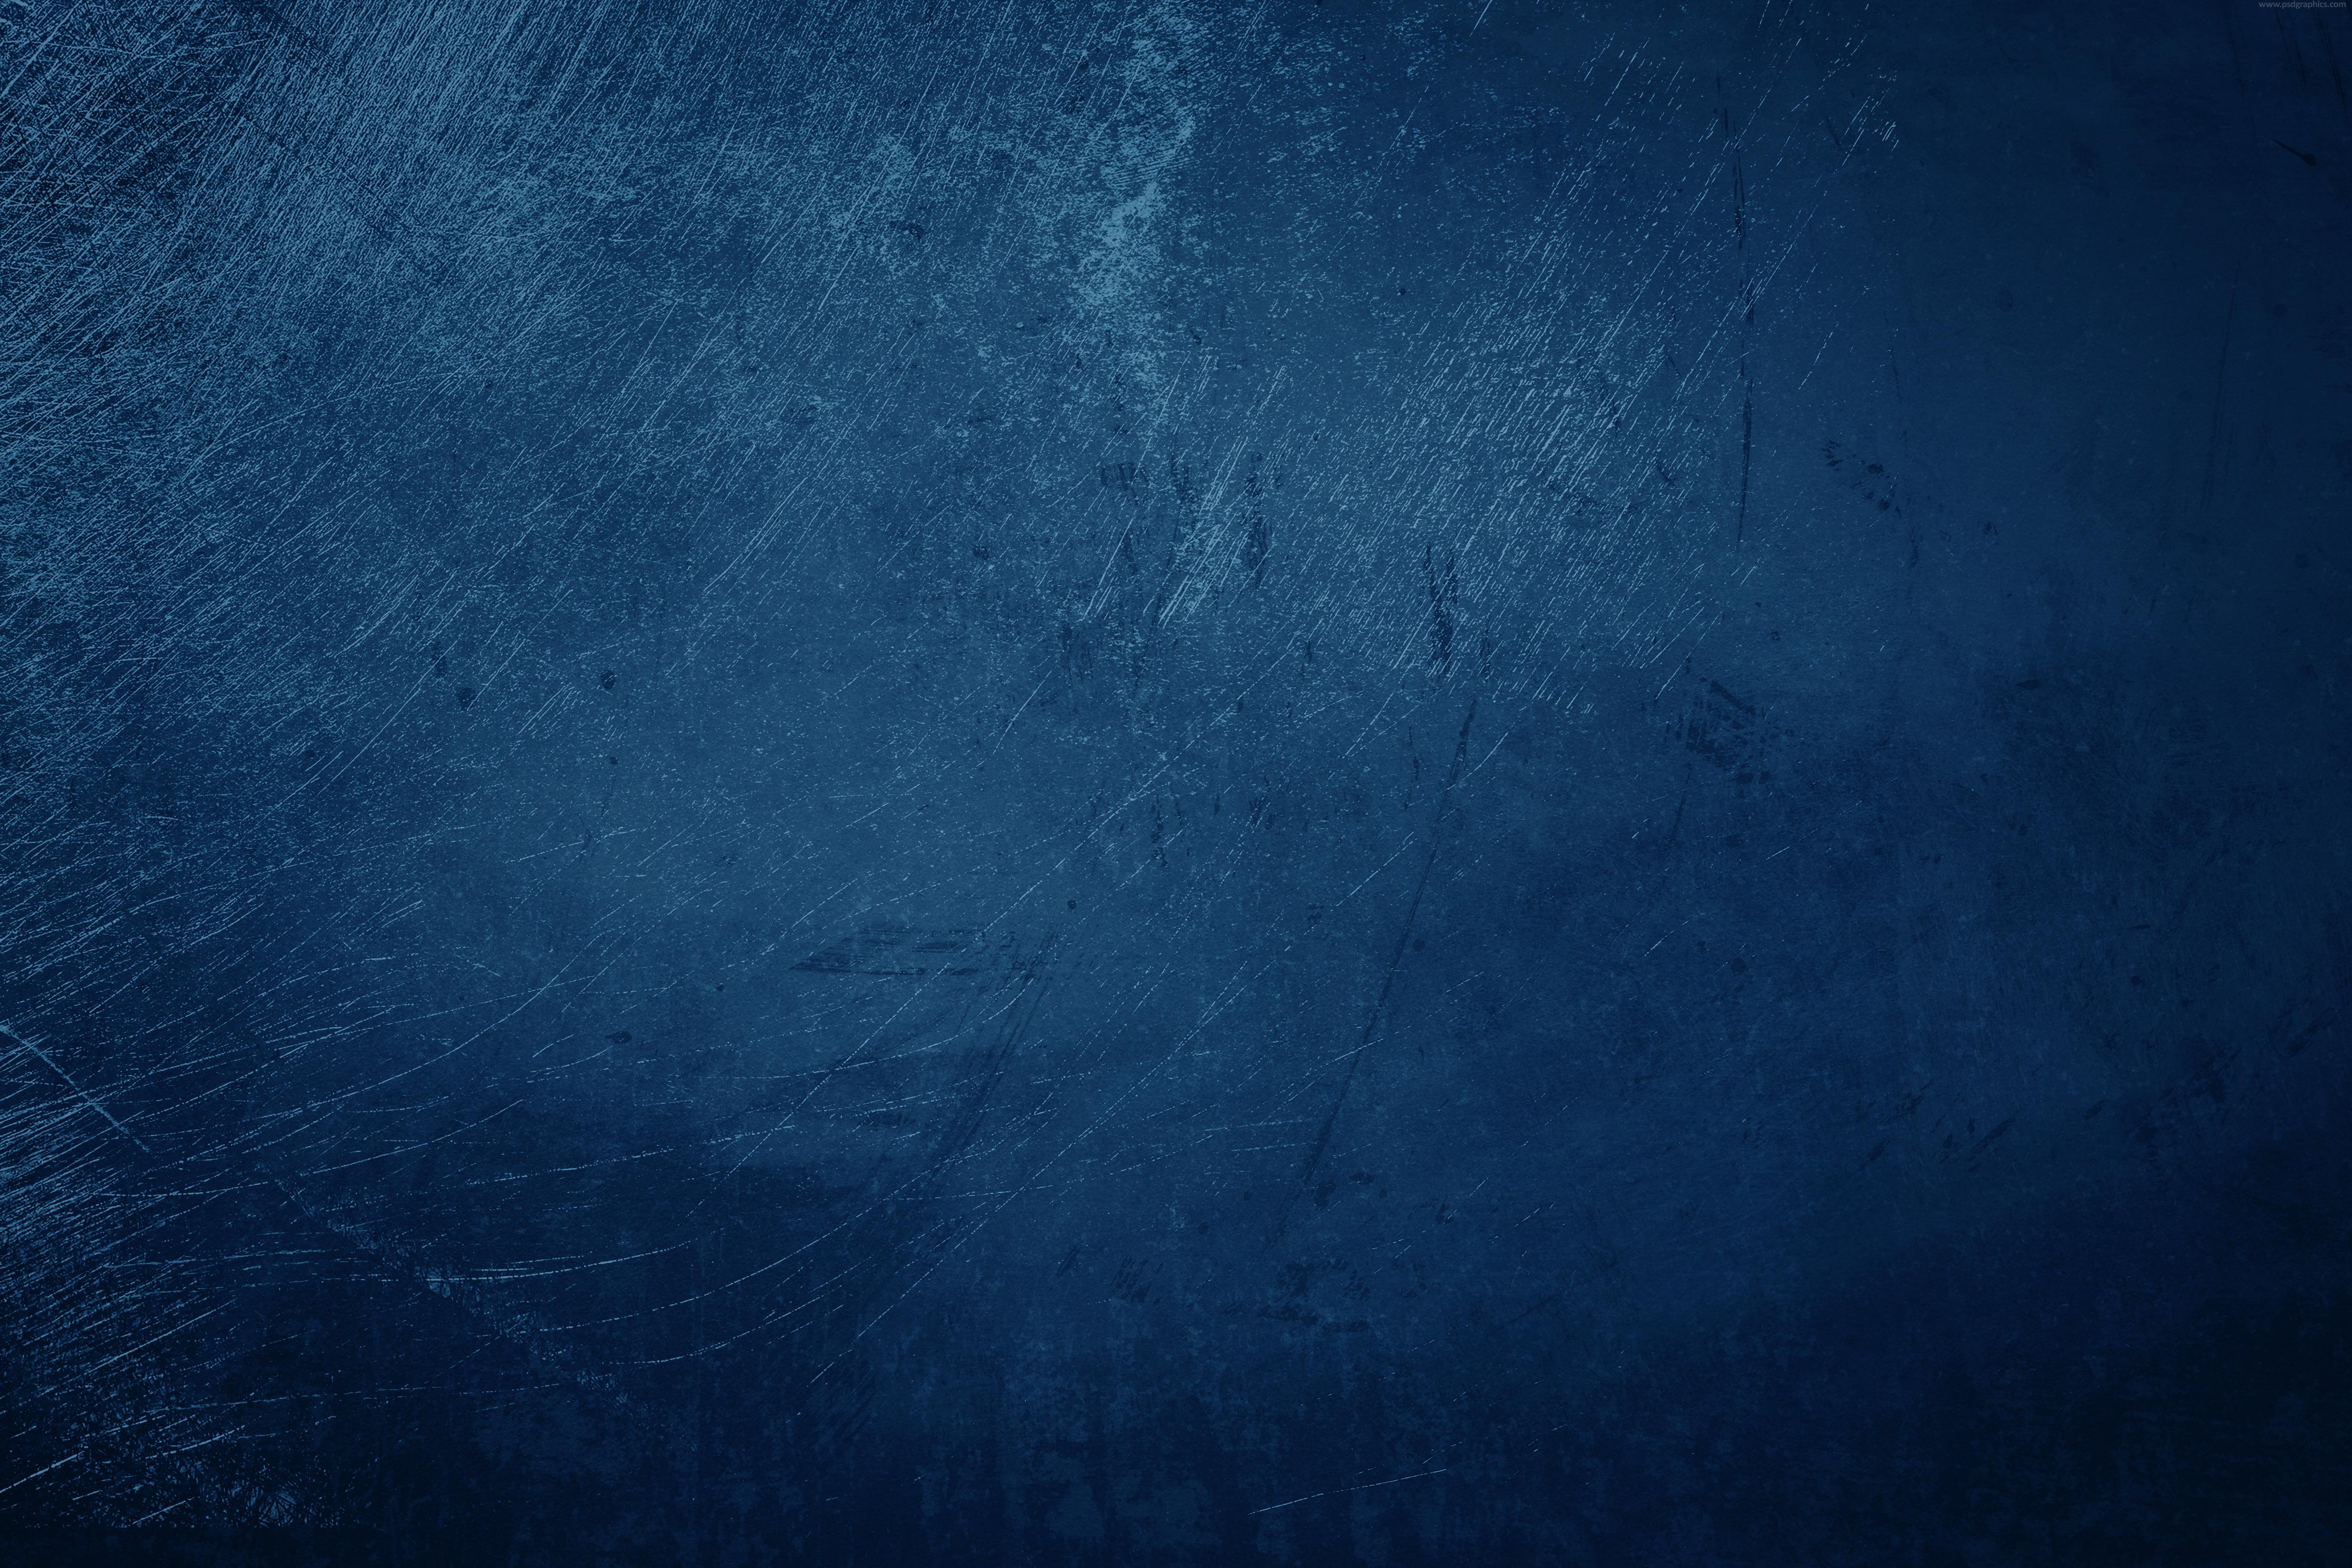 Blue grunge texture | PSDGraphics